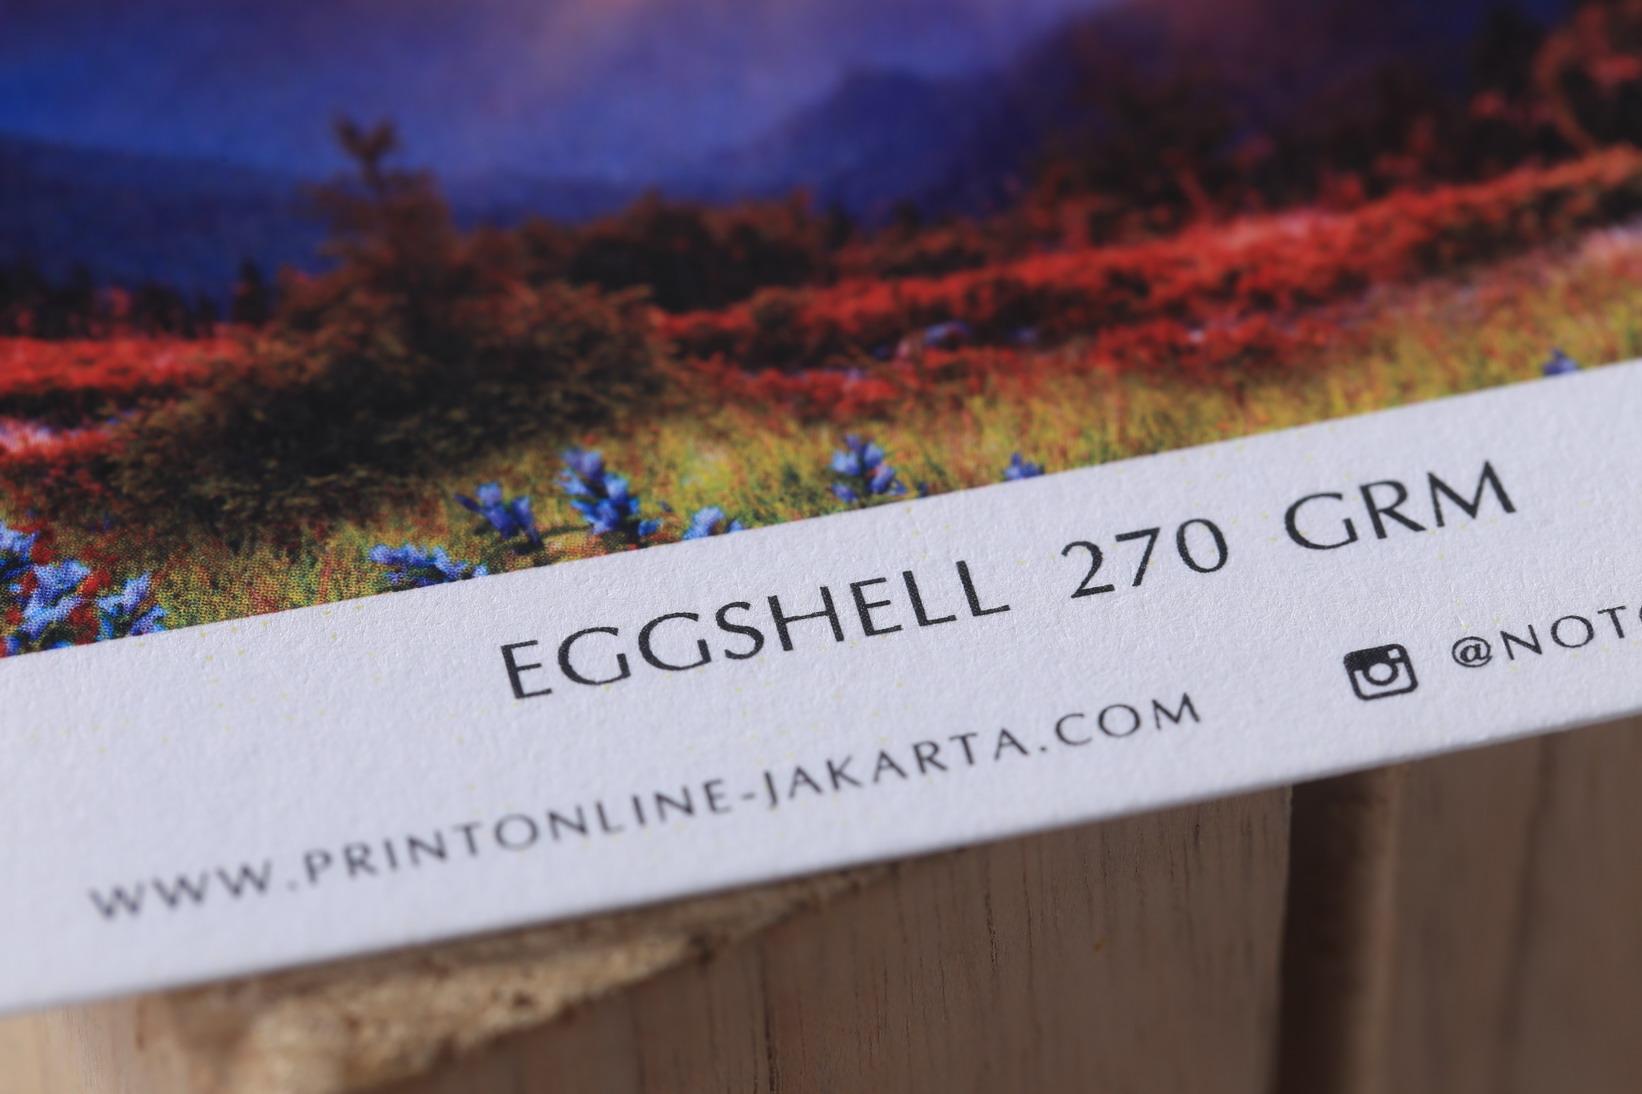 Eggshell  270 grm